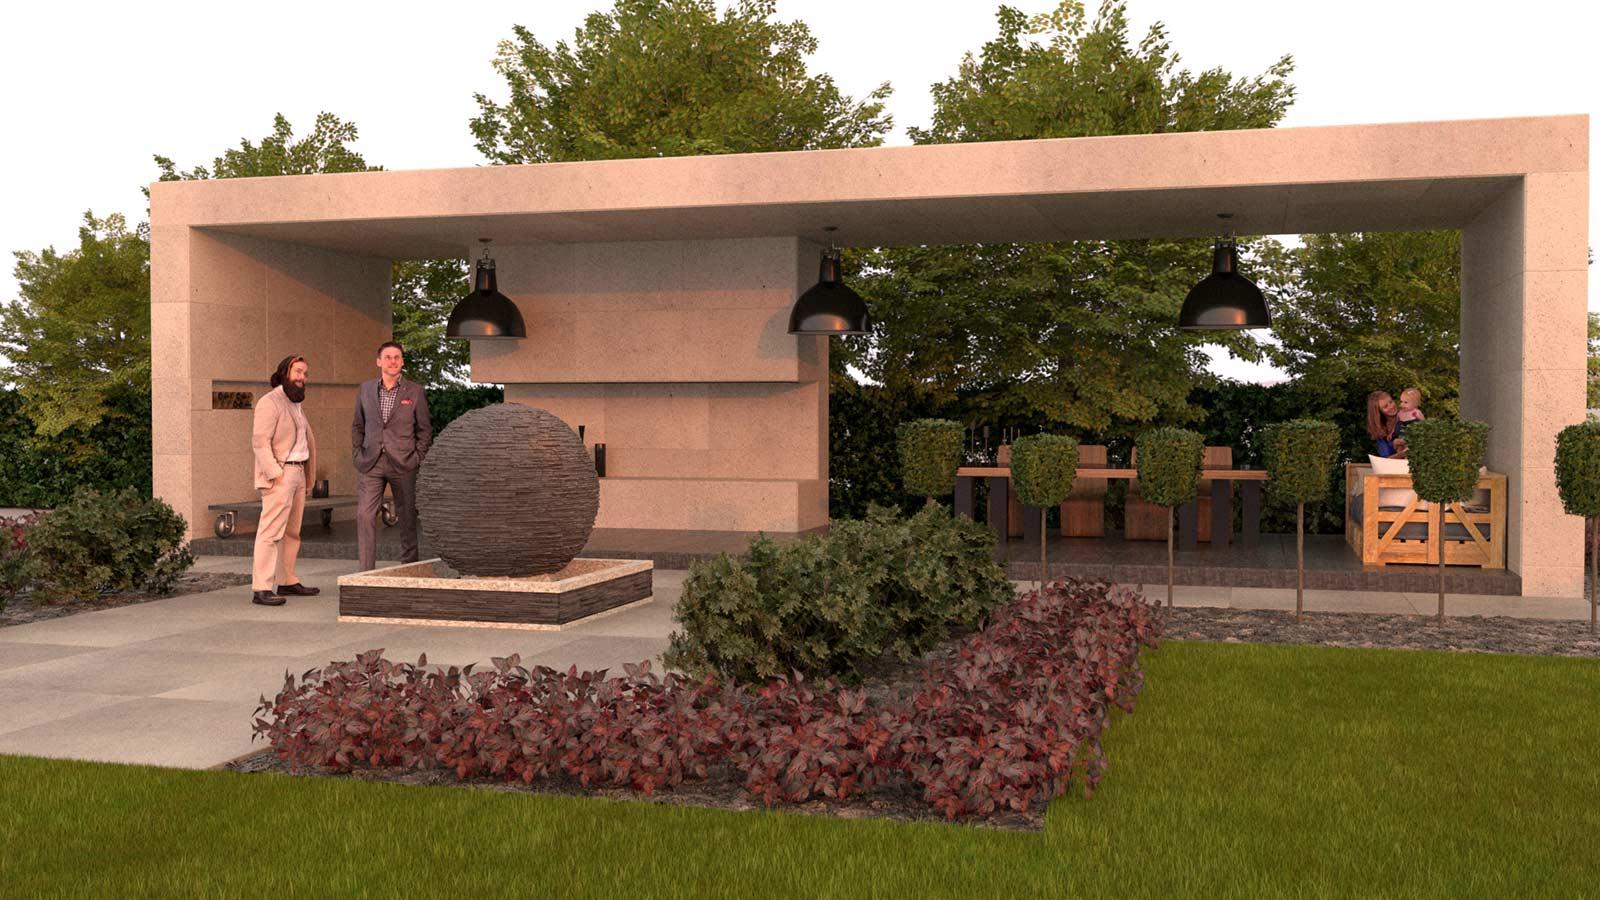 landscape architecture 3d render of garden